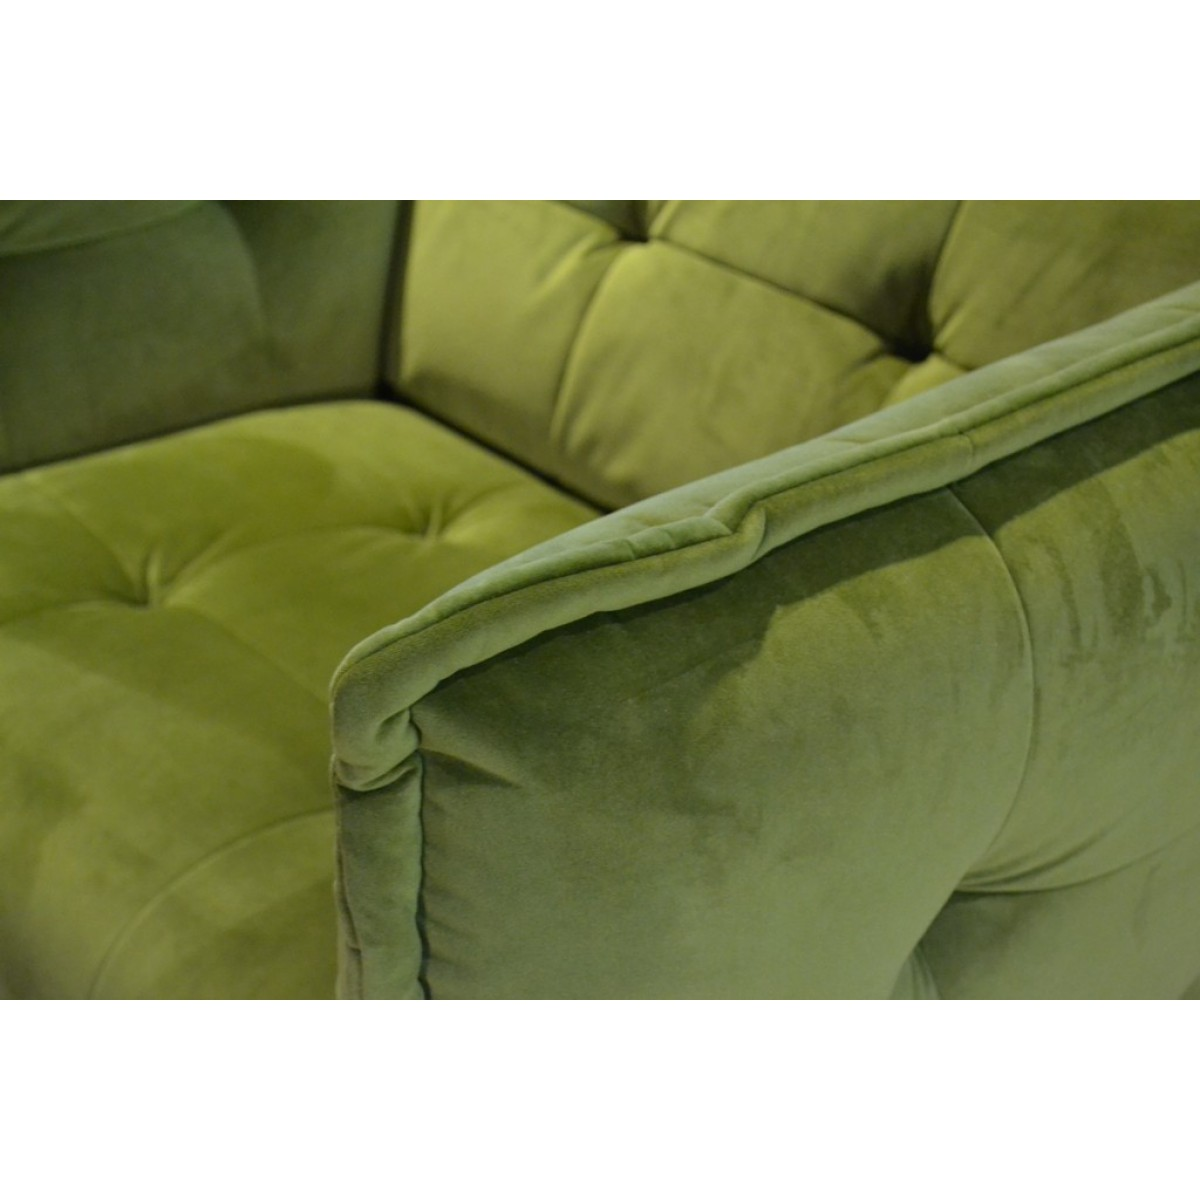 2,5-zits-bank_fauteuil_slimm_jim_patch_stof_seven_cognac_leer_tom_club_easy_sofa_detailarm